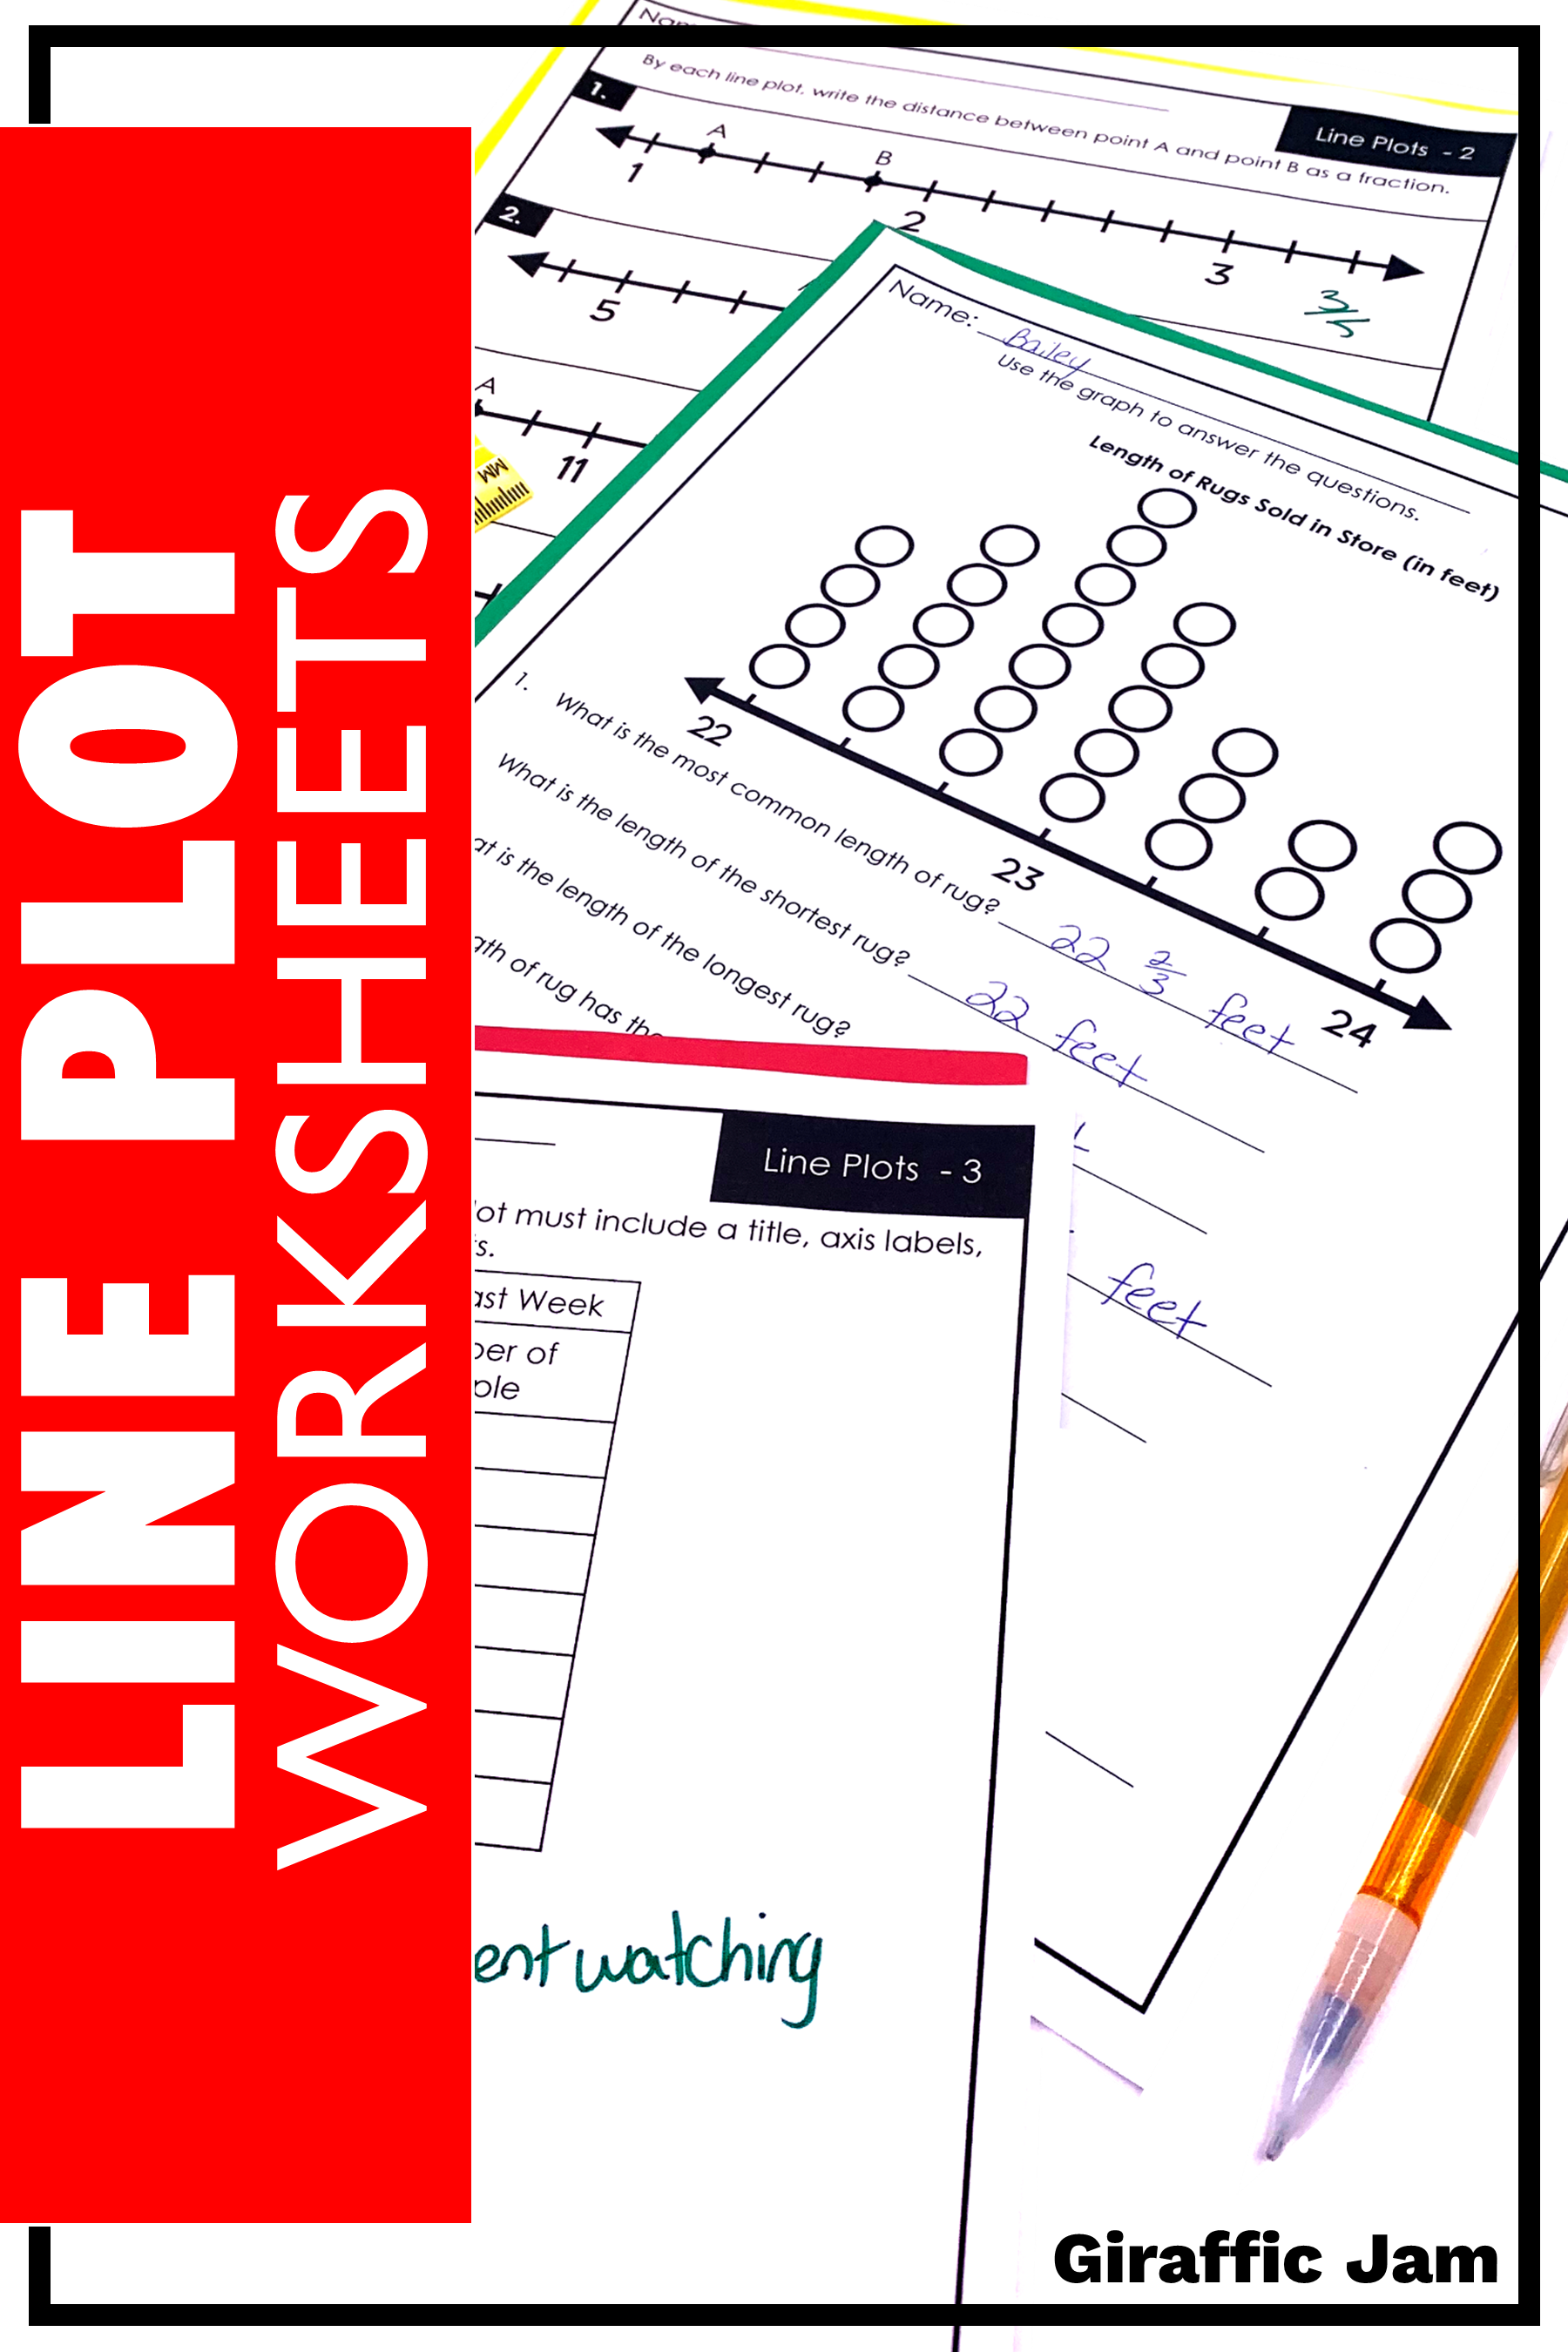 Line Plot Worksheets Measurement Homework Measurement Worksheets In 2021 Measurement Worksheets Line Plot Worksheets Measurement Homework [ 2700 x 1800 Pixel ]